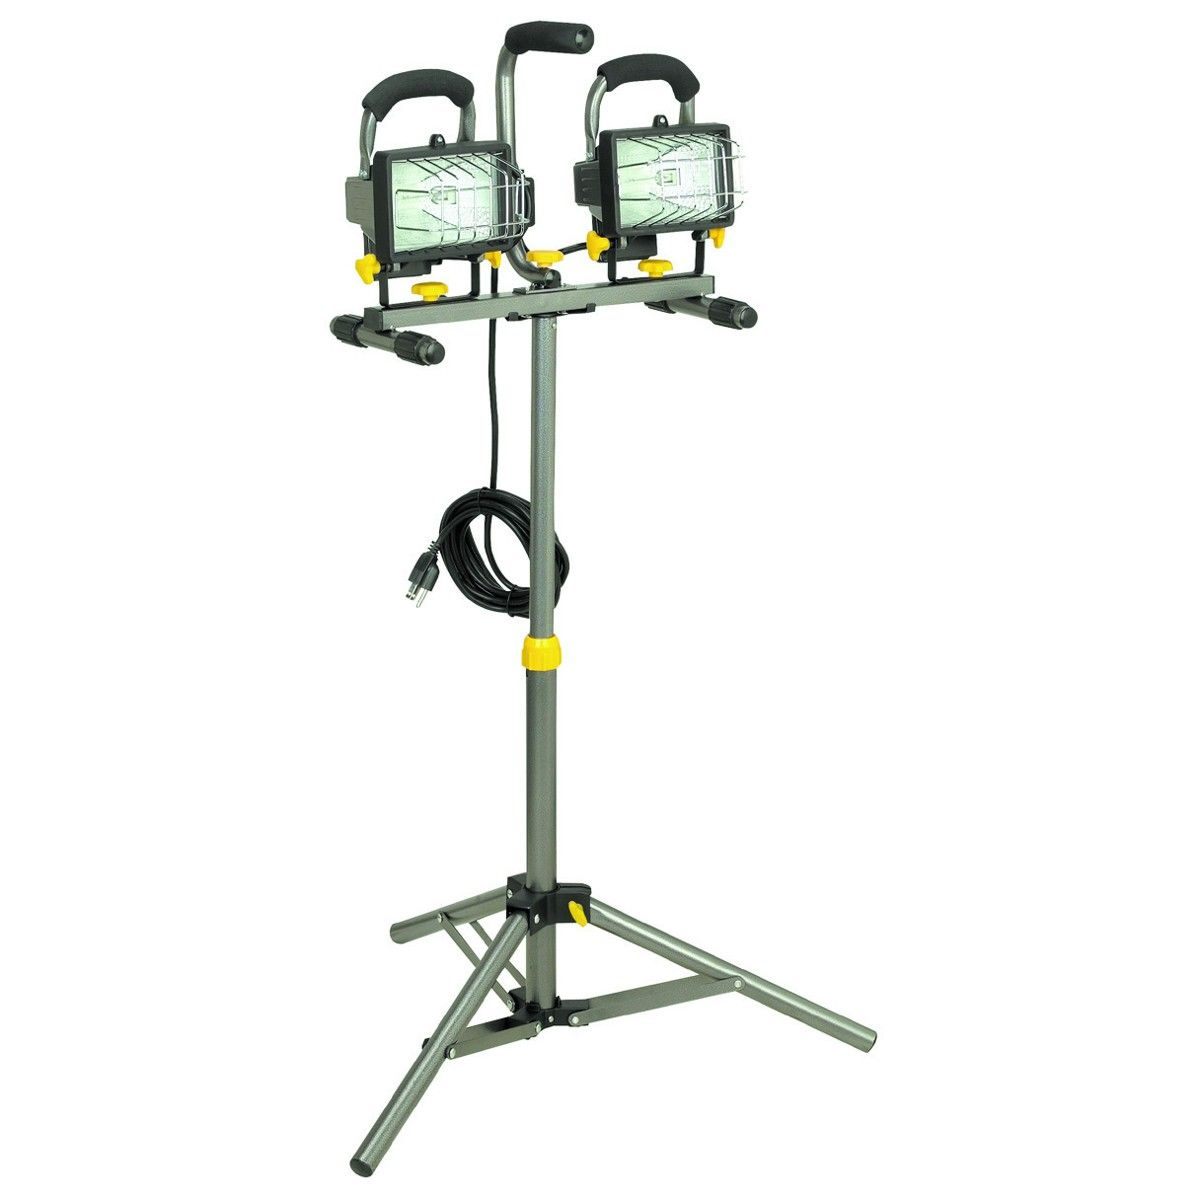 Exceptional Luminar Work 40123 500 Watt Dual Head Halogen Shop Light $29.99 @  HarborFreight.com Nice Ideas